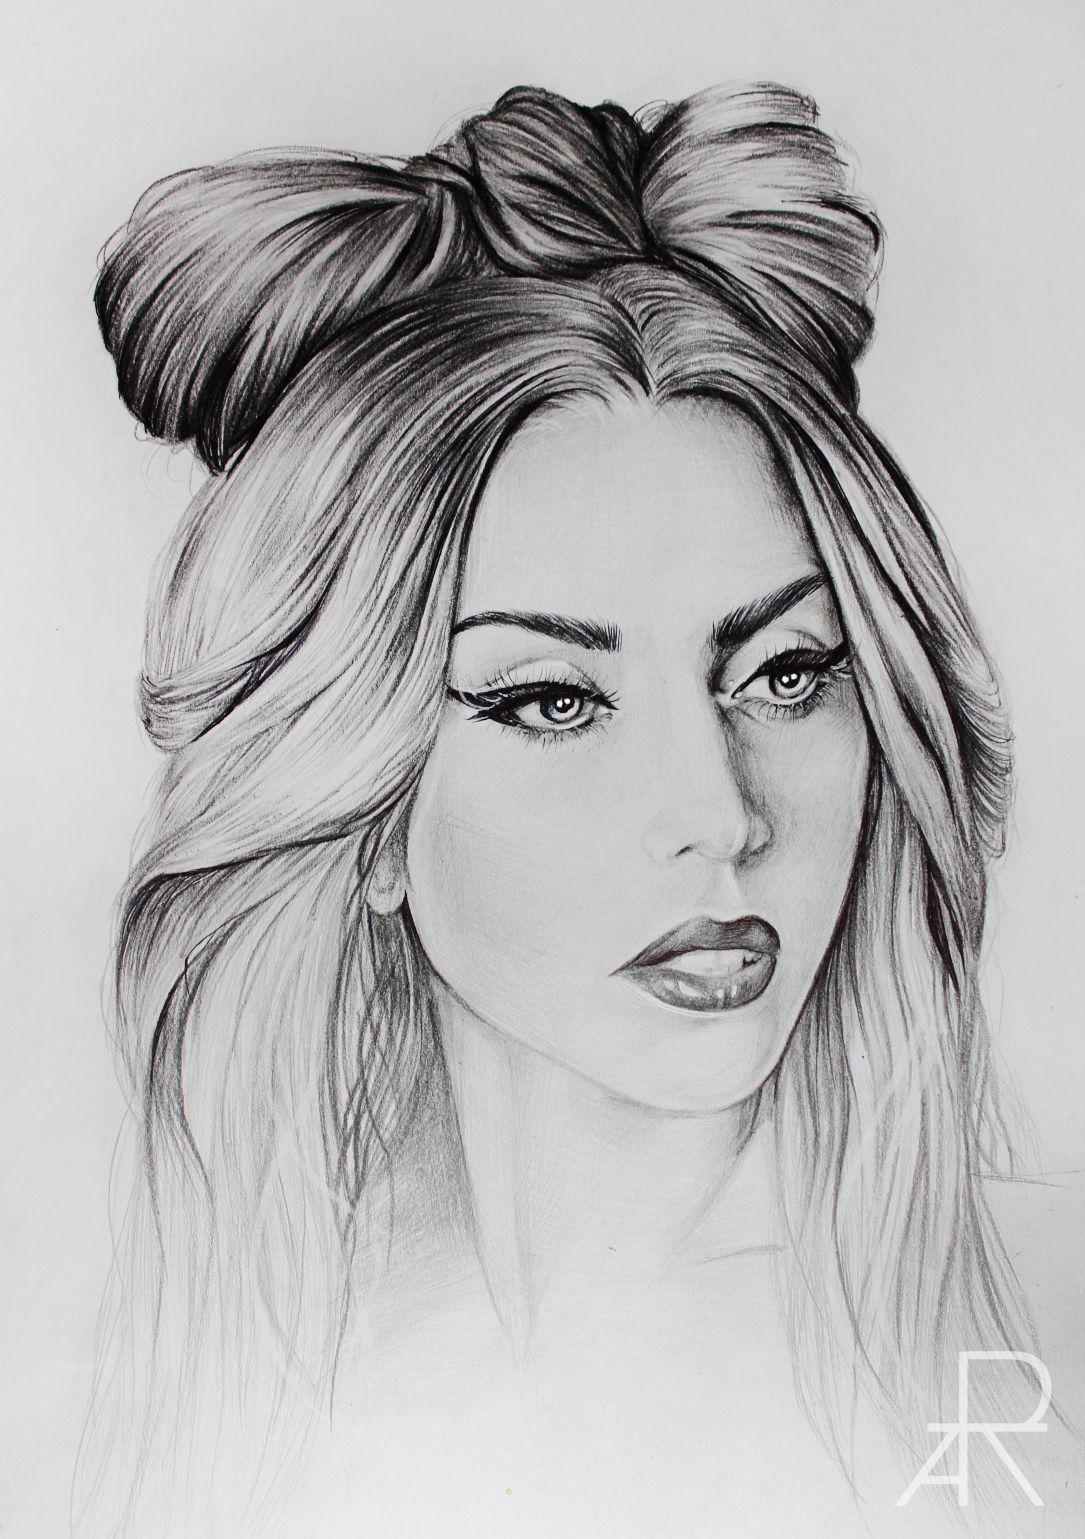 Pencil Drawing Of Lady Gaga More At Www Facebook Com Modesta Moreart Www Instagram Com Modeztart Portrait Drawing Portrait Celebrity Drawings